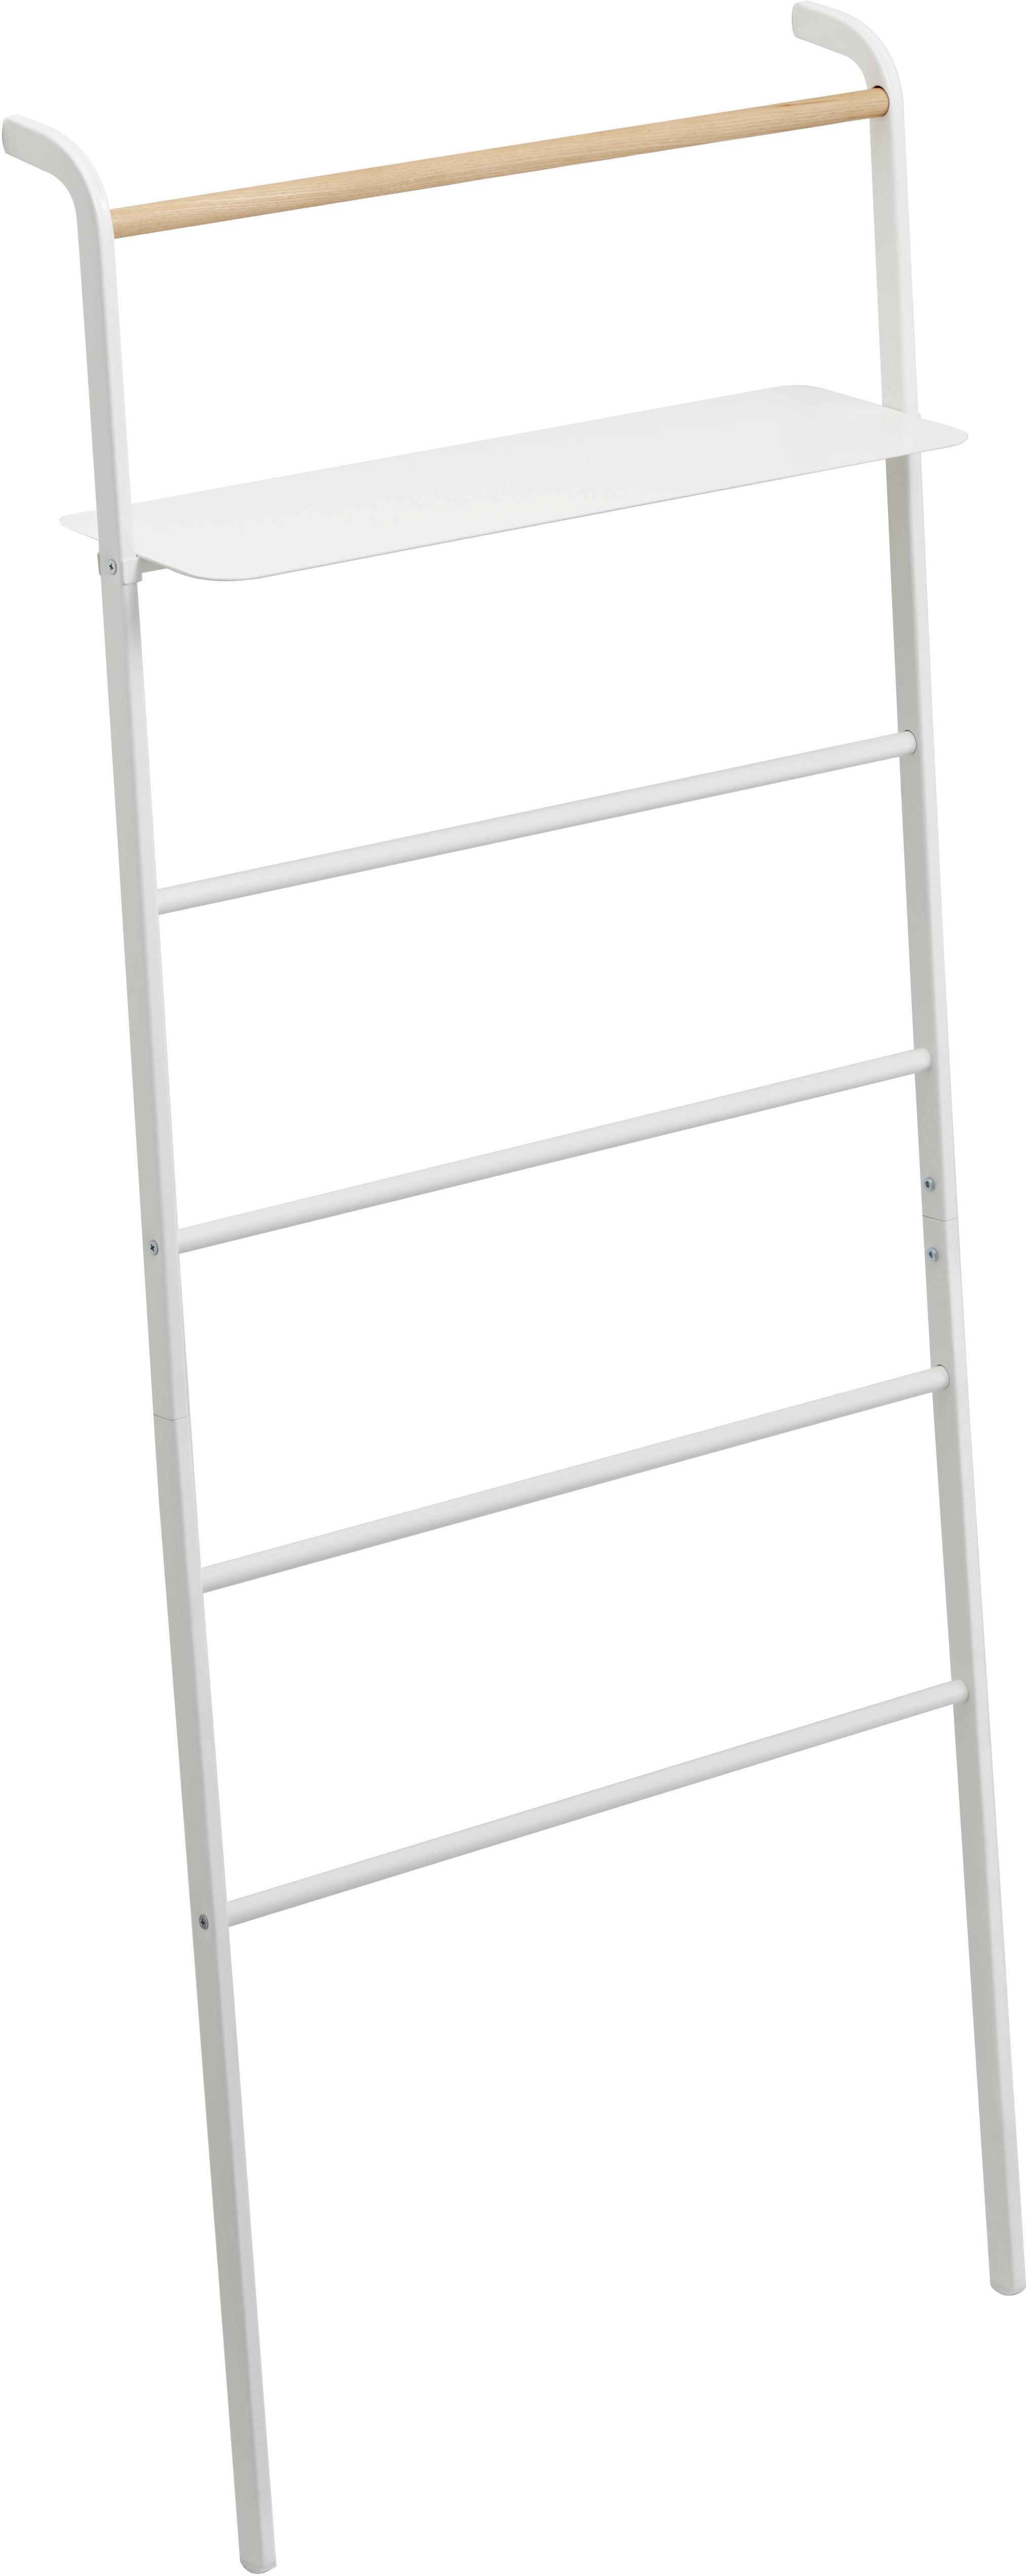 Estantería de escalera de metal Lena, Estructura: metal con pintura en polv, Blanco, An 66 x F 160 cm